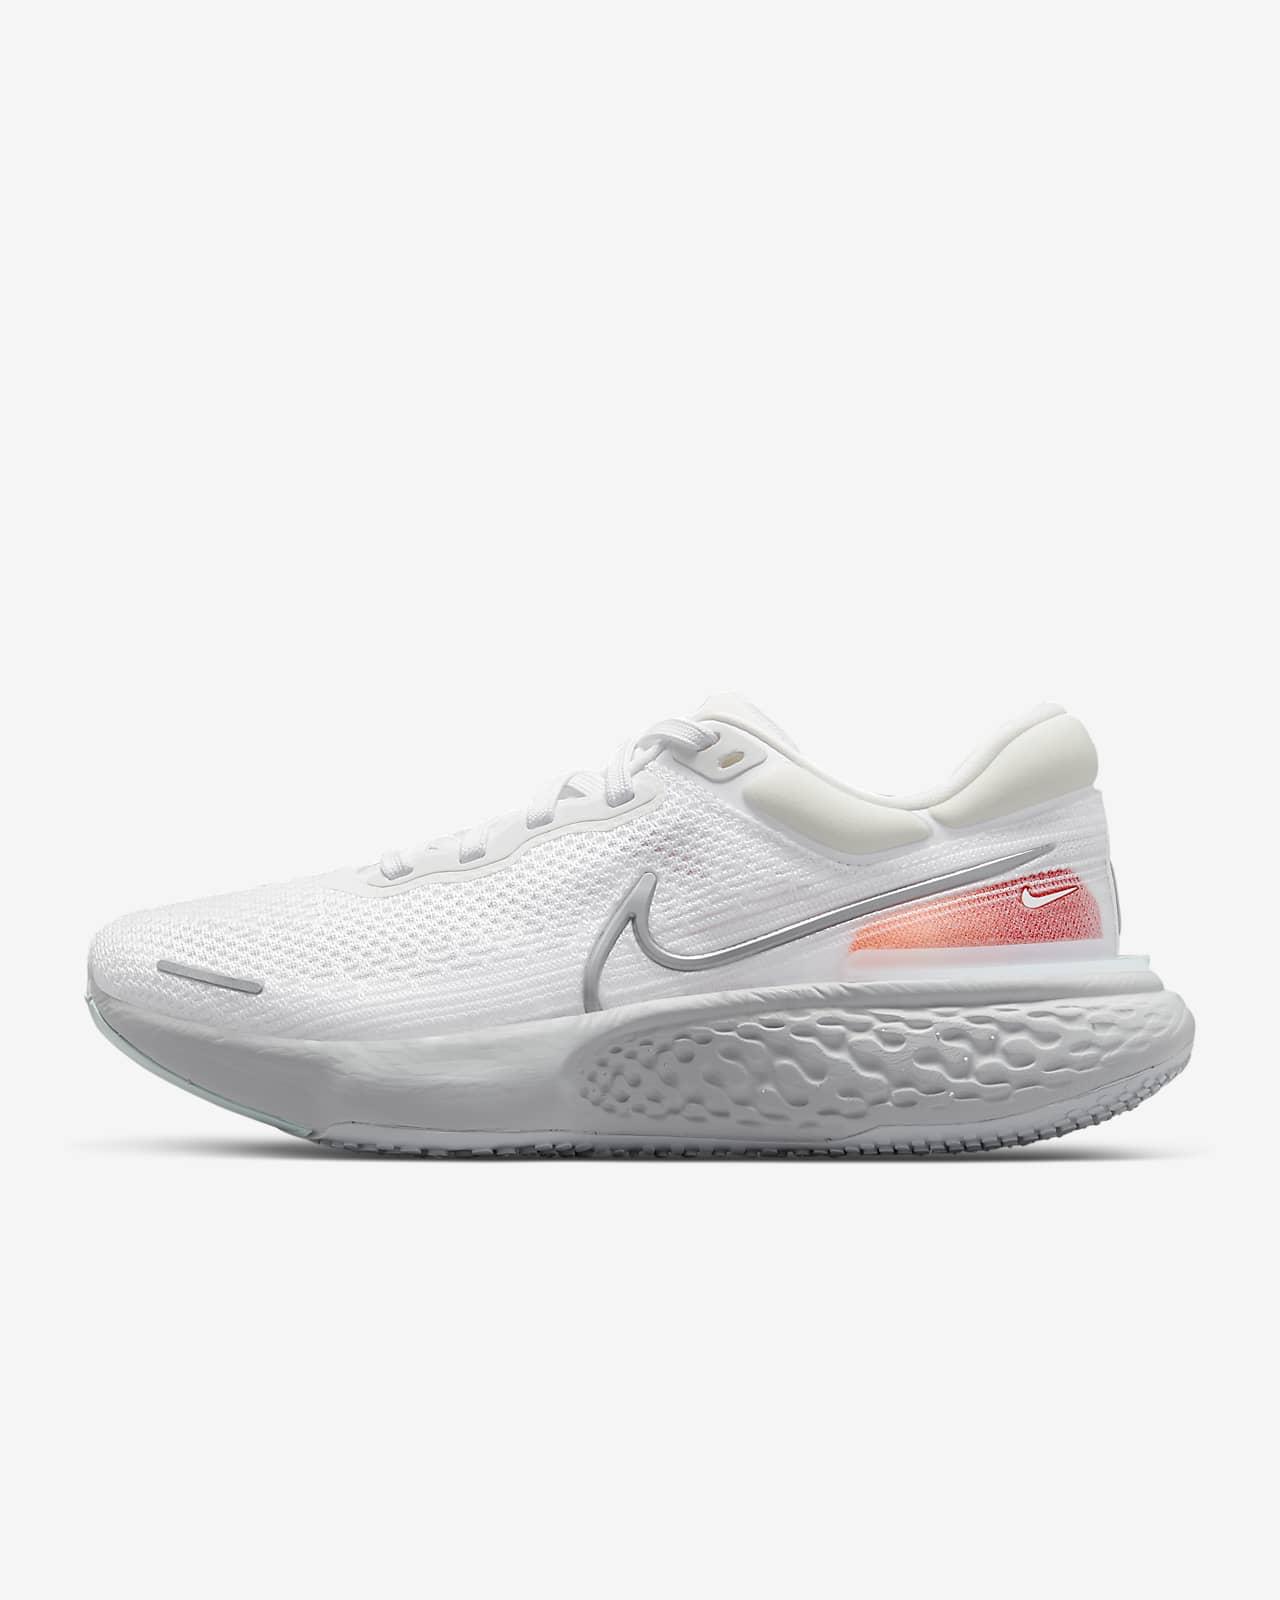 Chaussure de running sur route Nike ZoomX Invincible Run Flyknit pour Homme